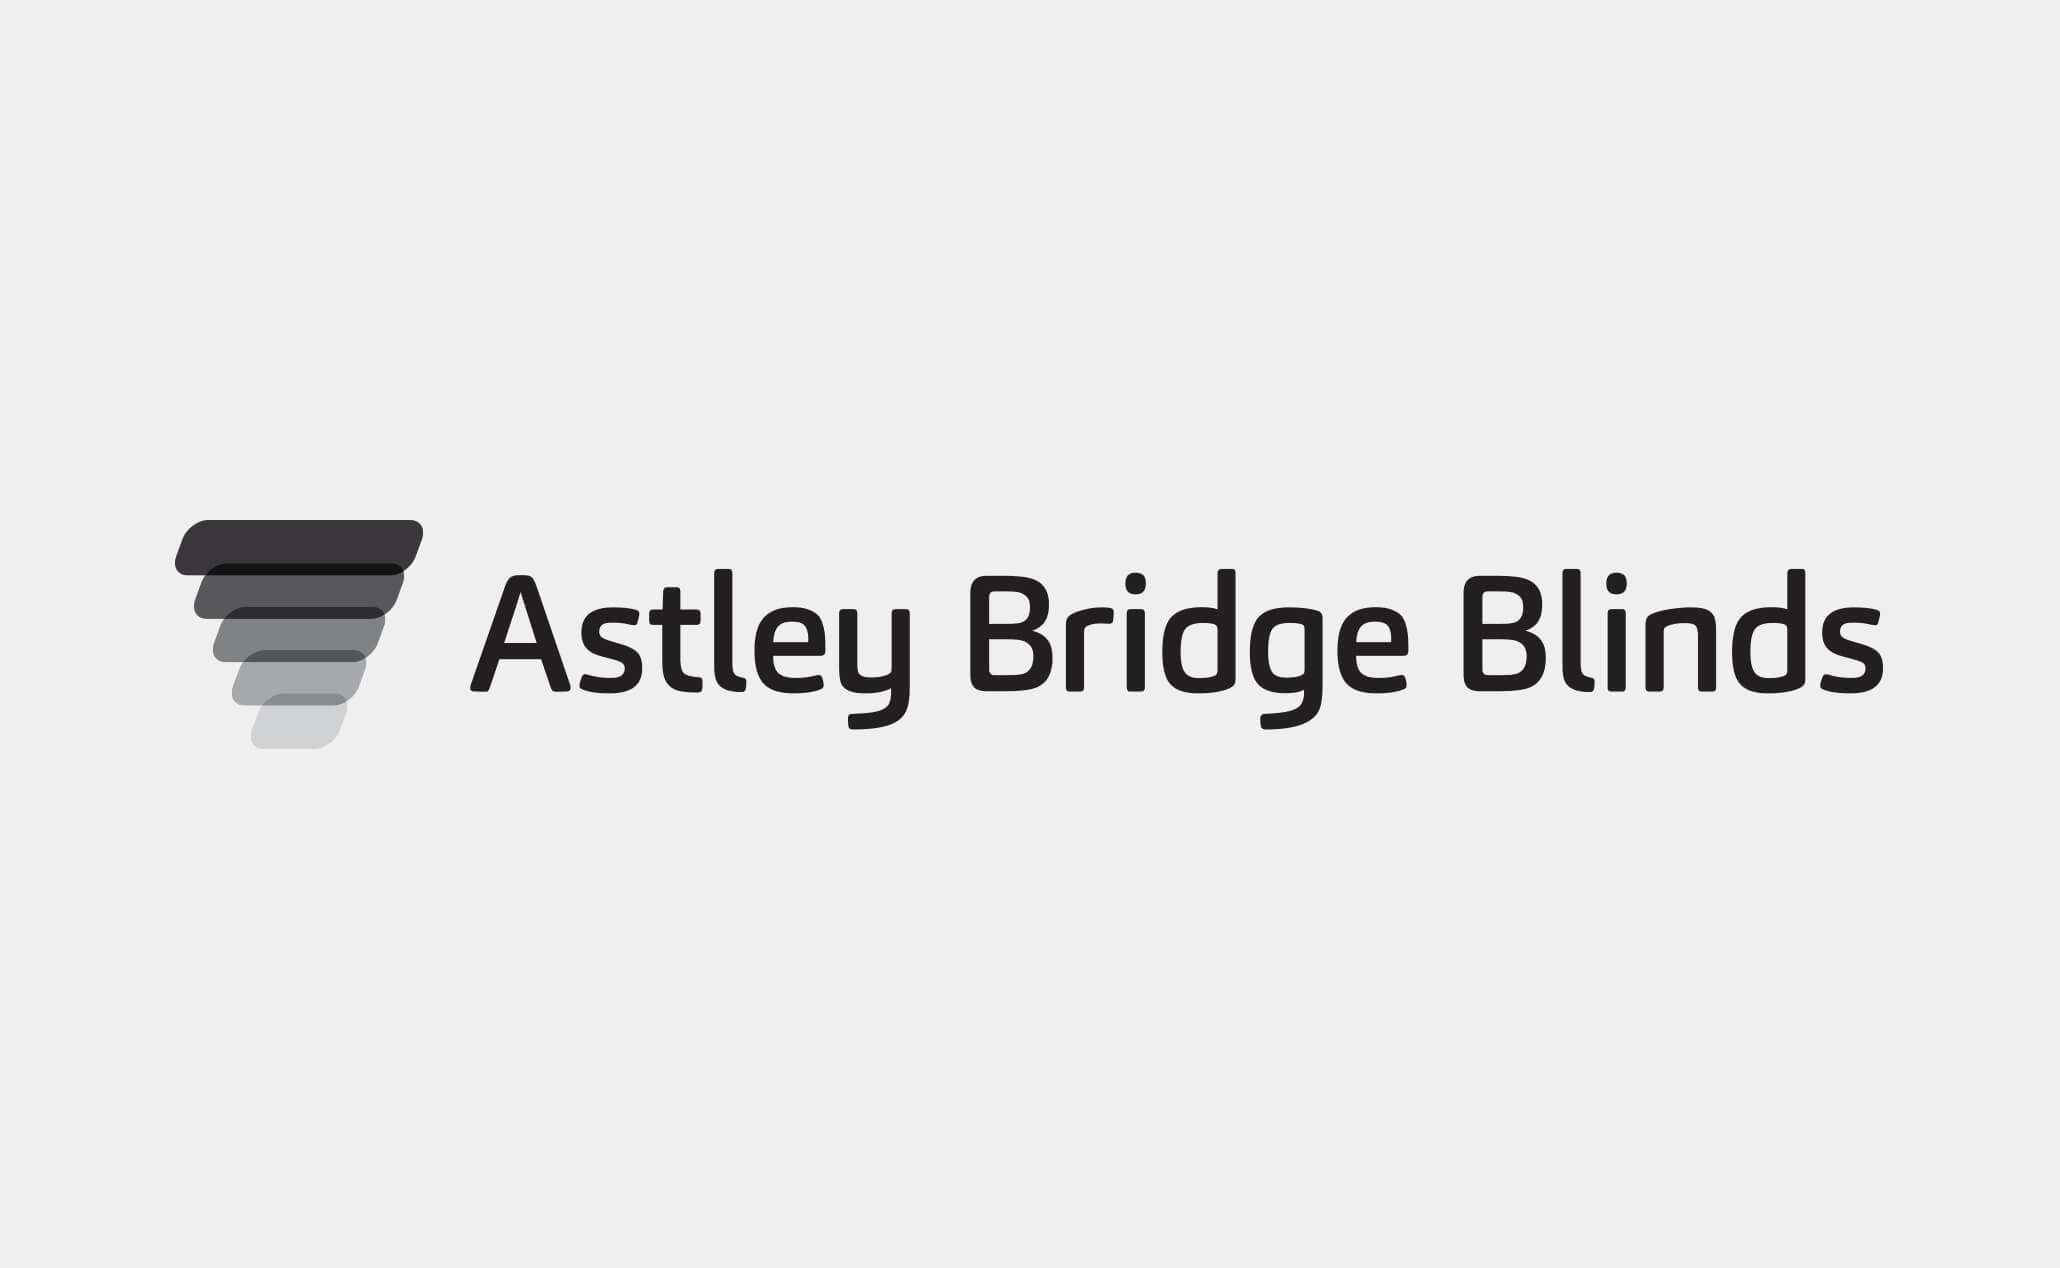 Astley Bridge Blinds logo